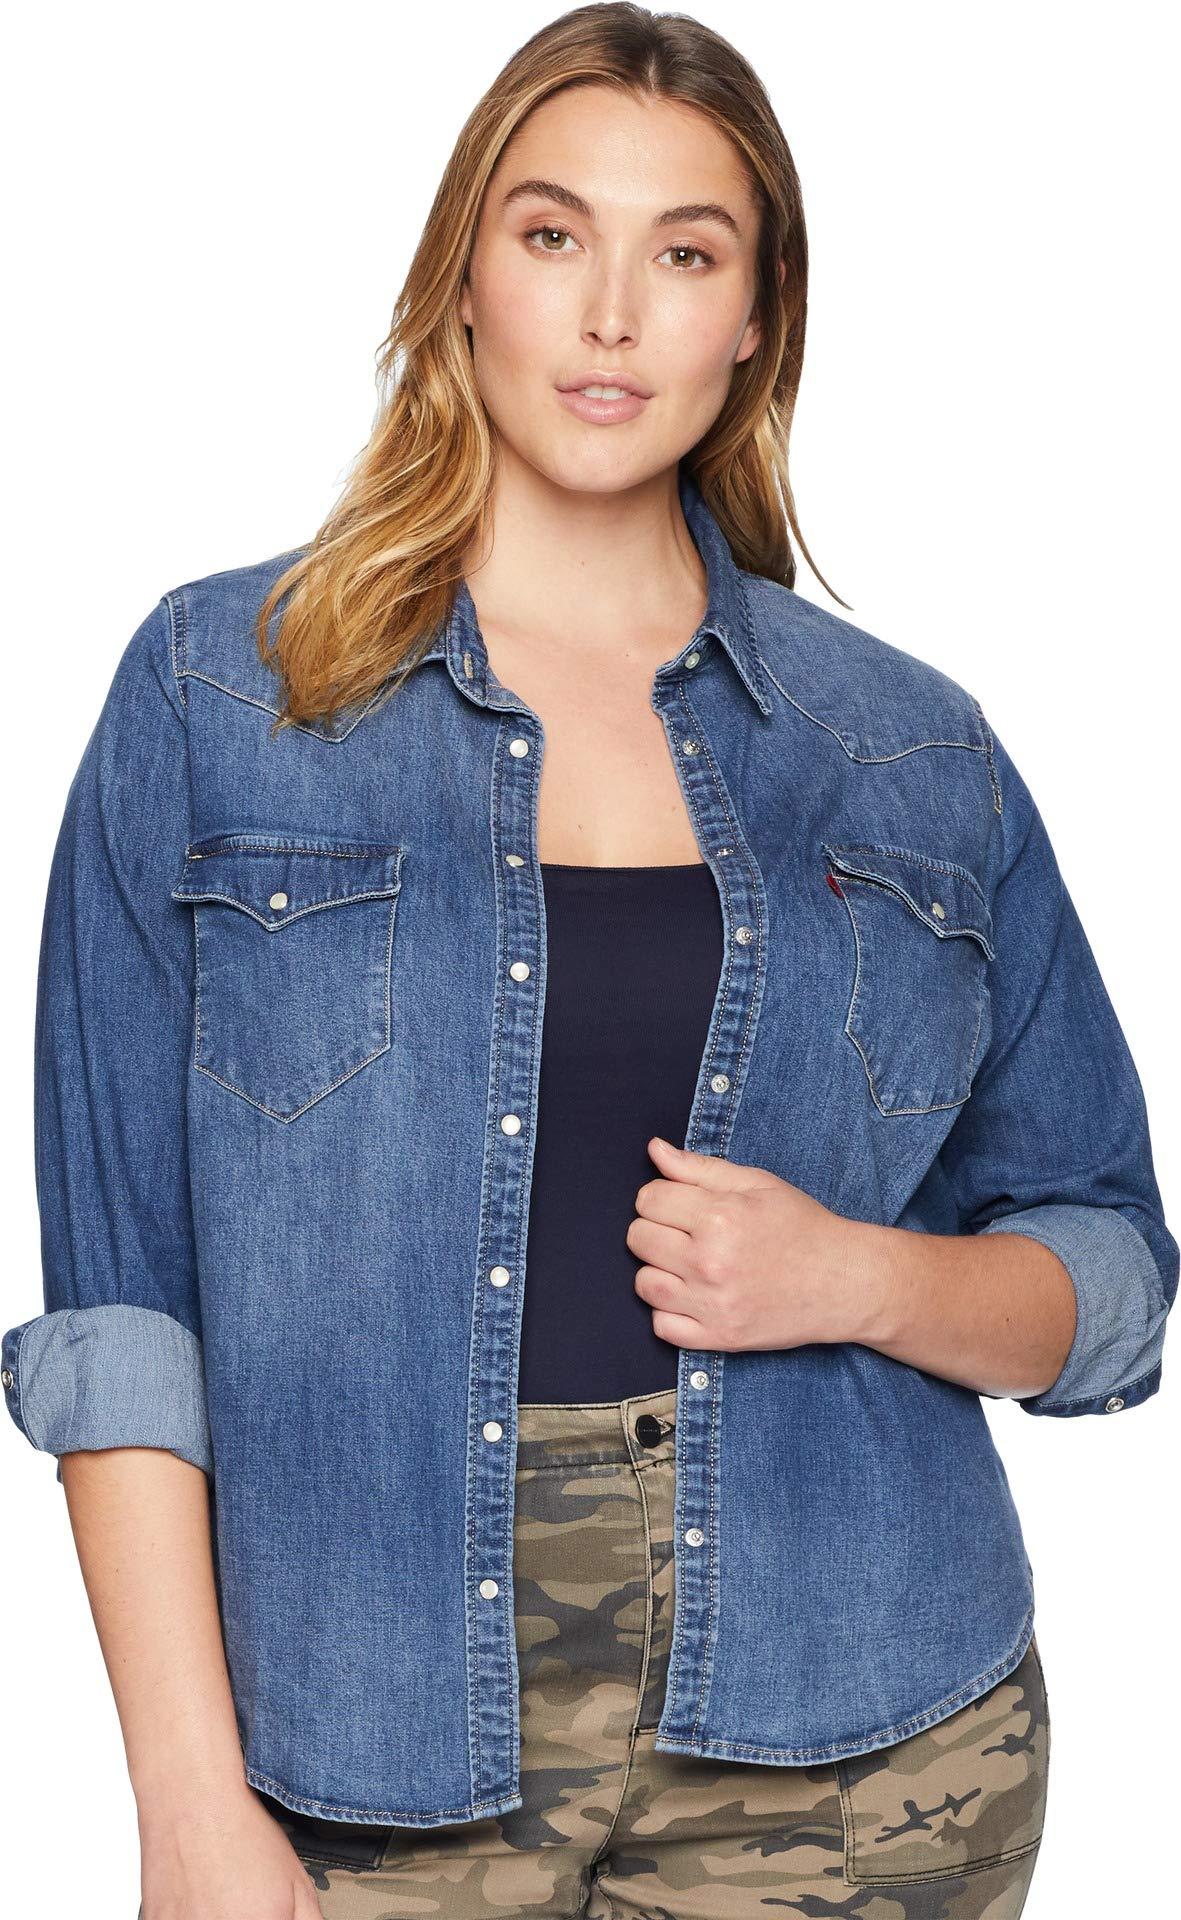 Levi's Women's Plus-Size Western Shirt, Lotta Love, 3 X by Levi's